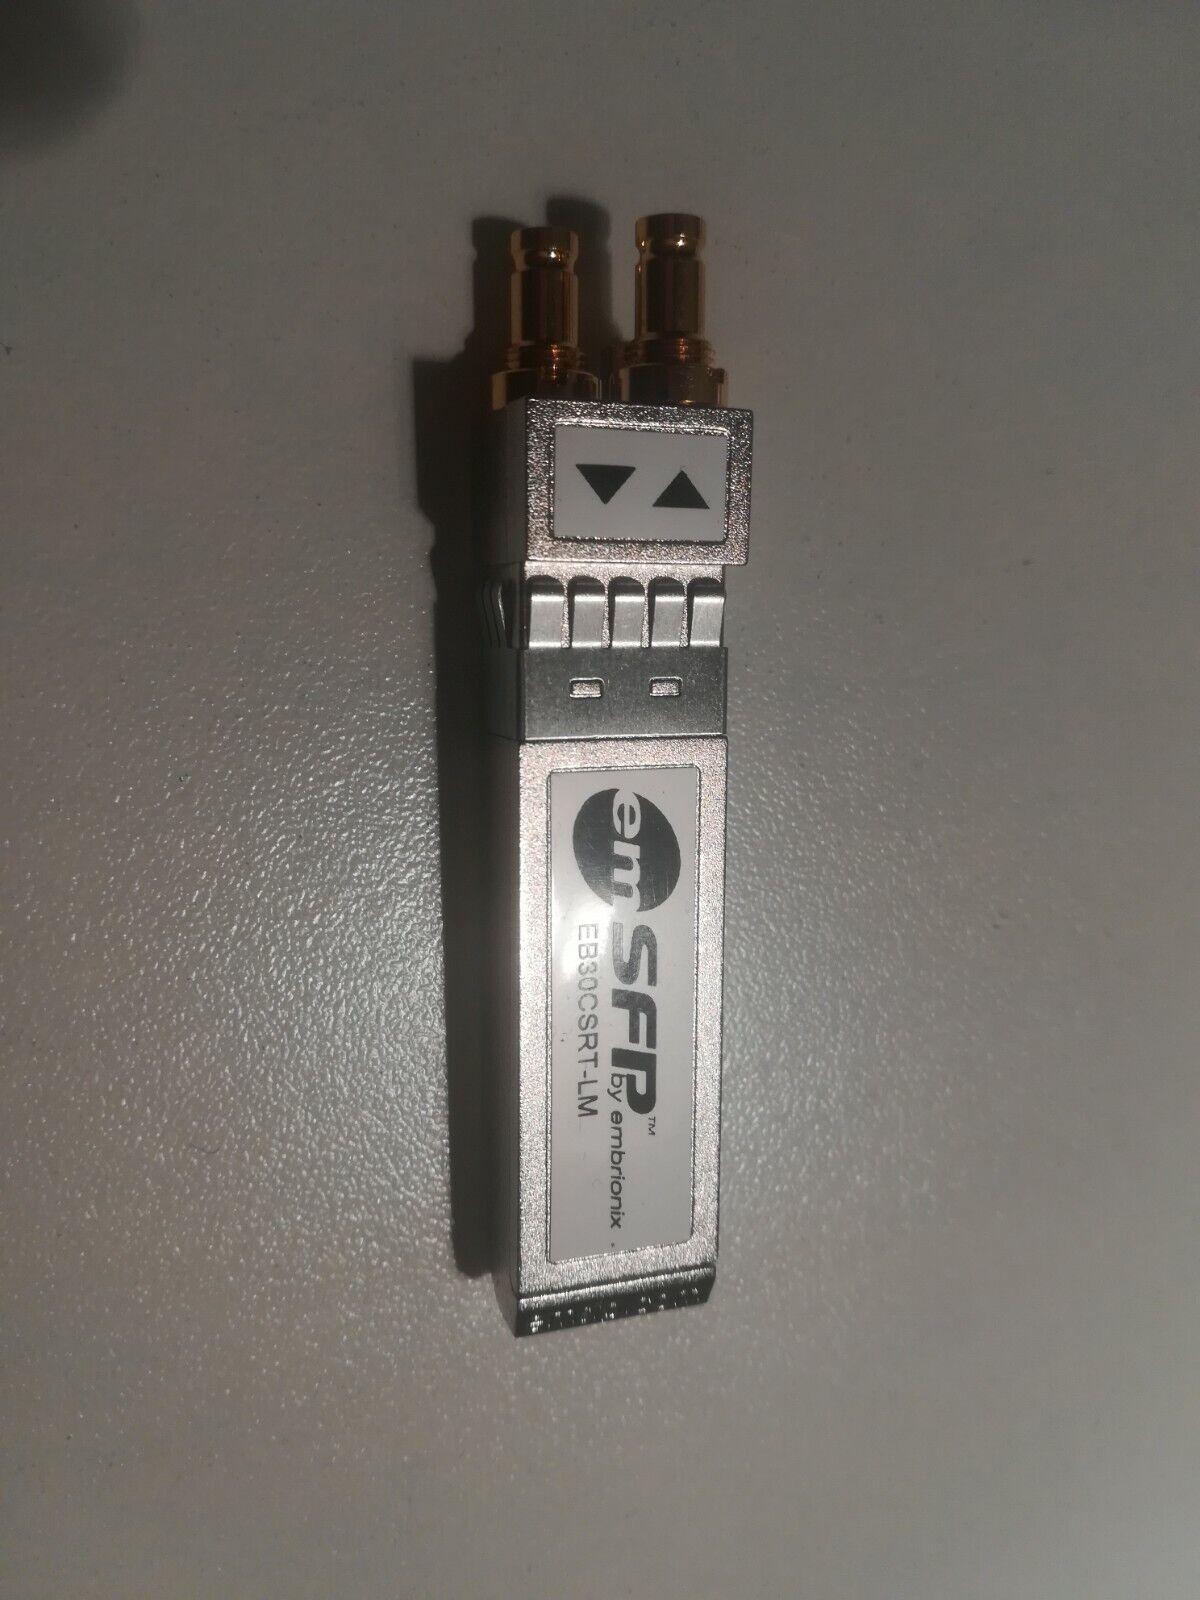 3G/HD/SD/ASI video SFP (emSFP) coaxial, transceiver eb30csrt-lm